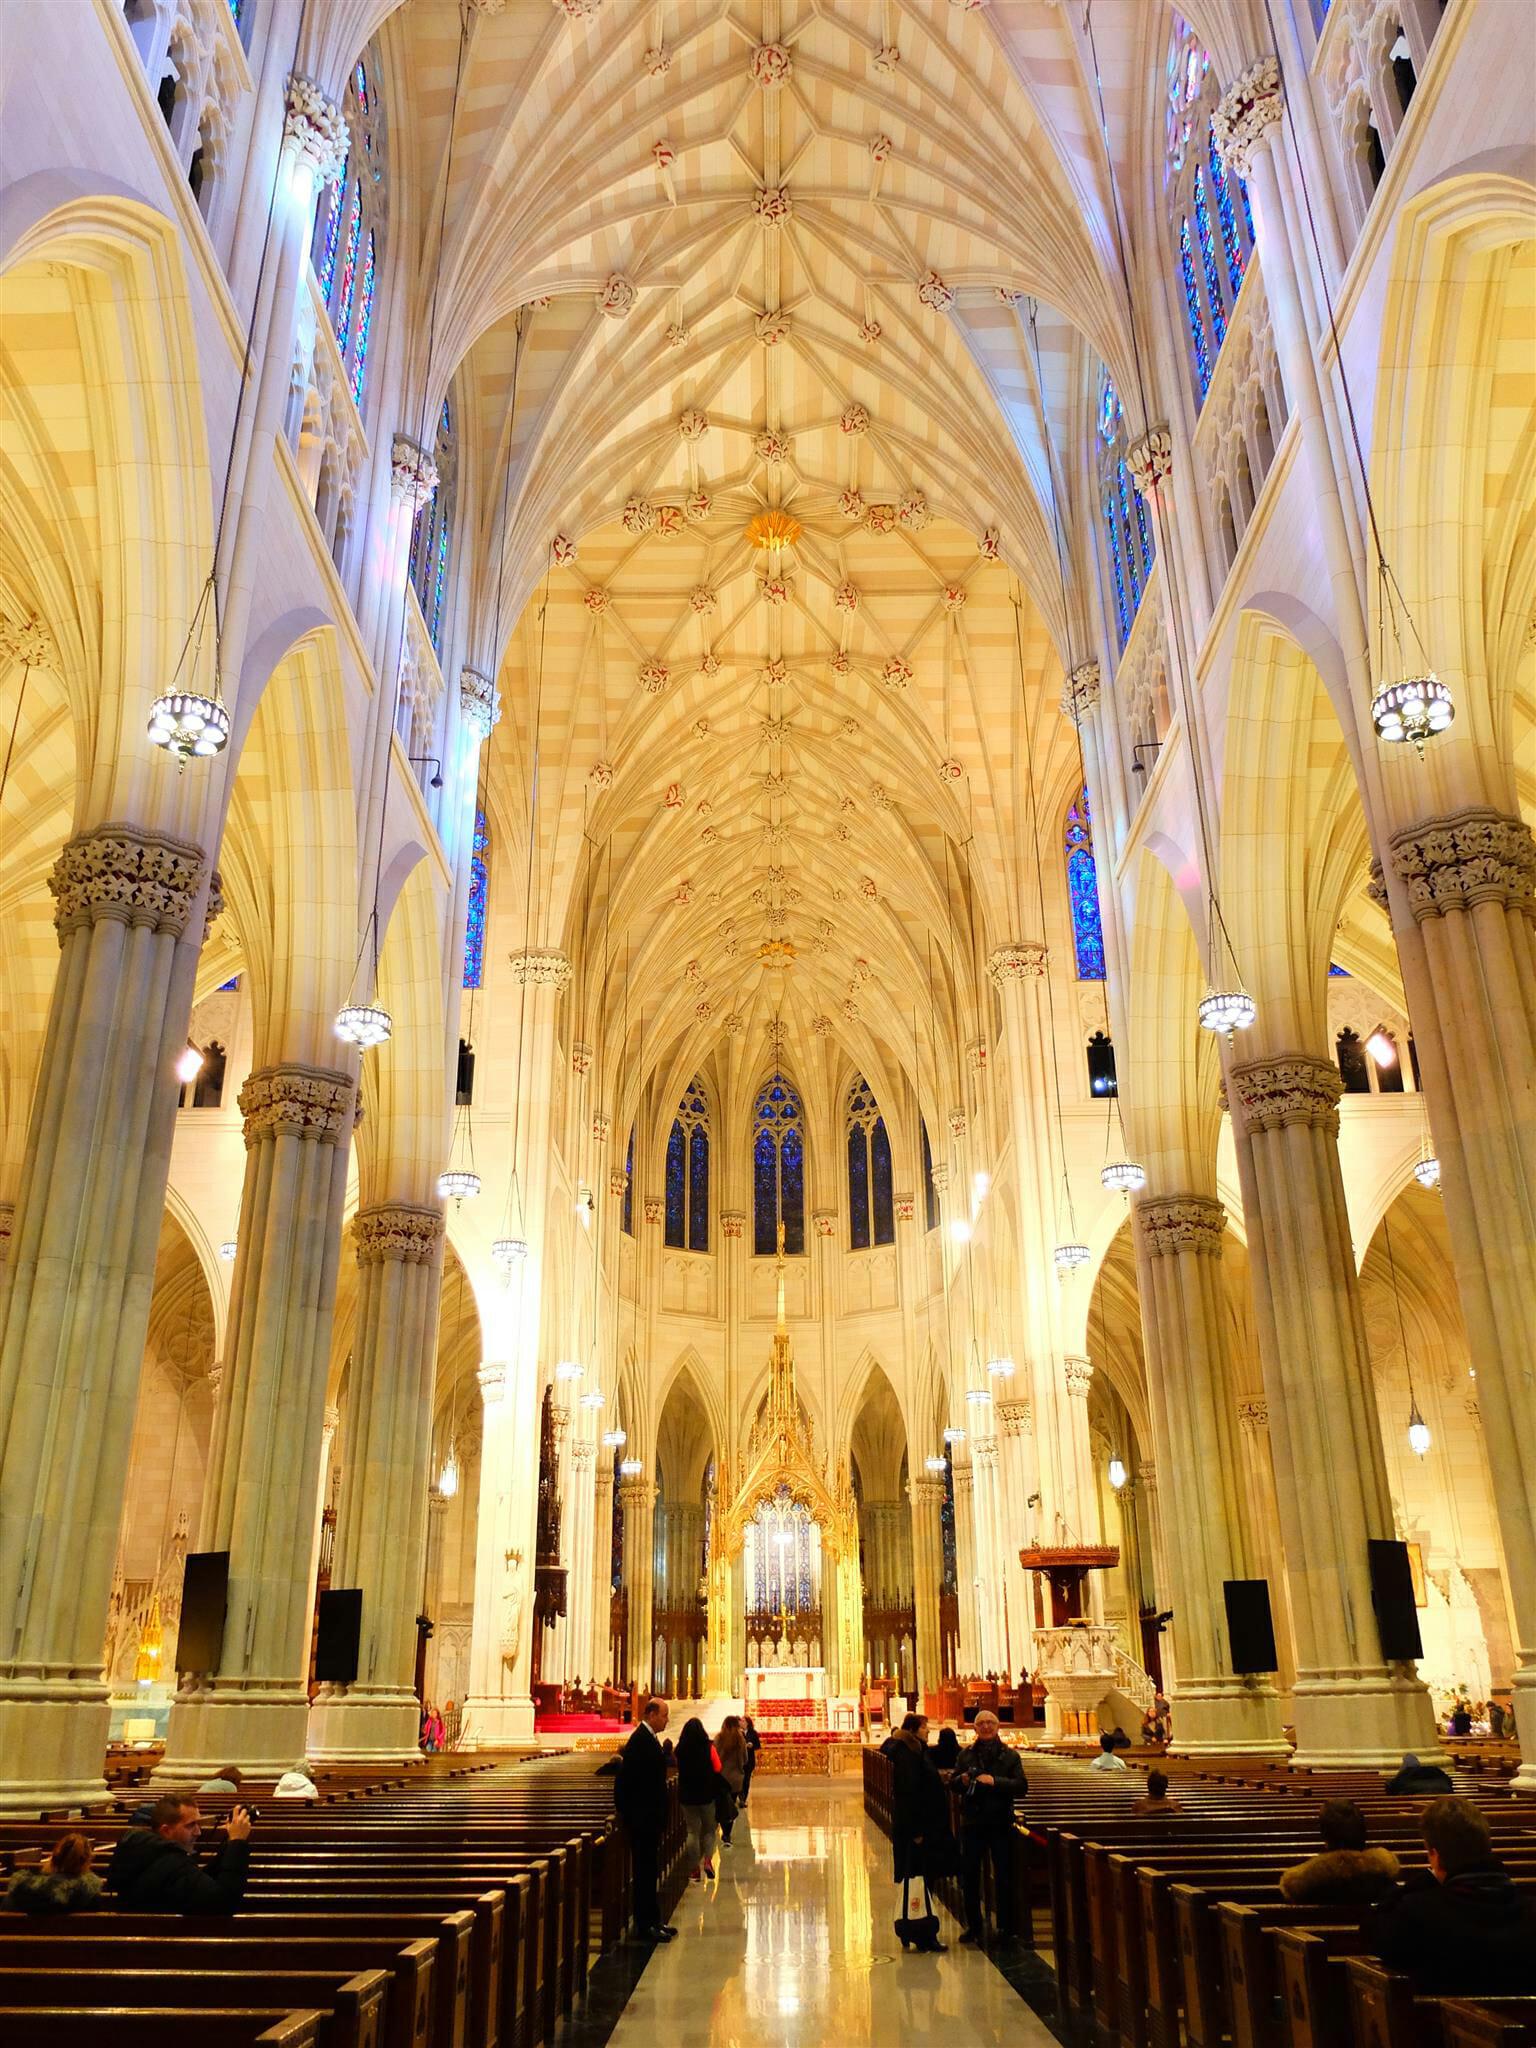 NYC St Patricks Cathetral Inside High Quality Wallpaper